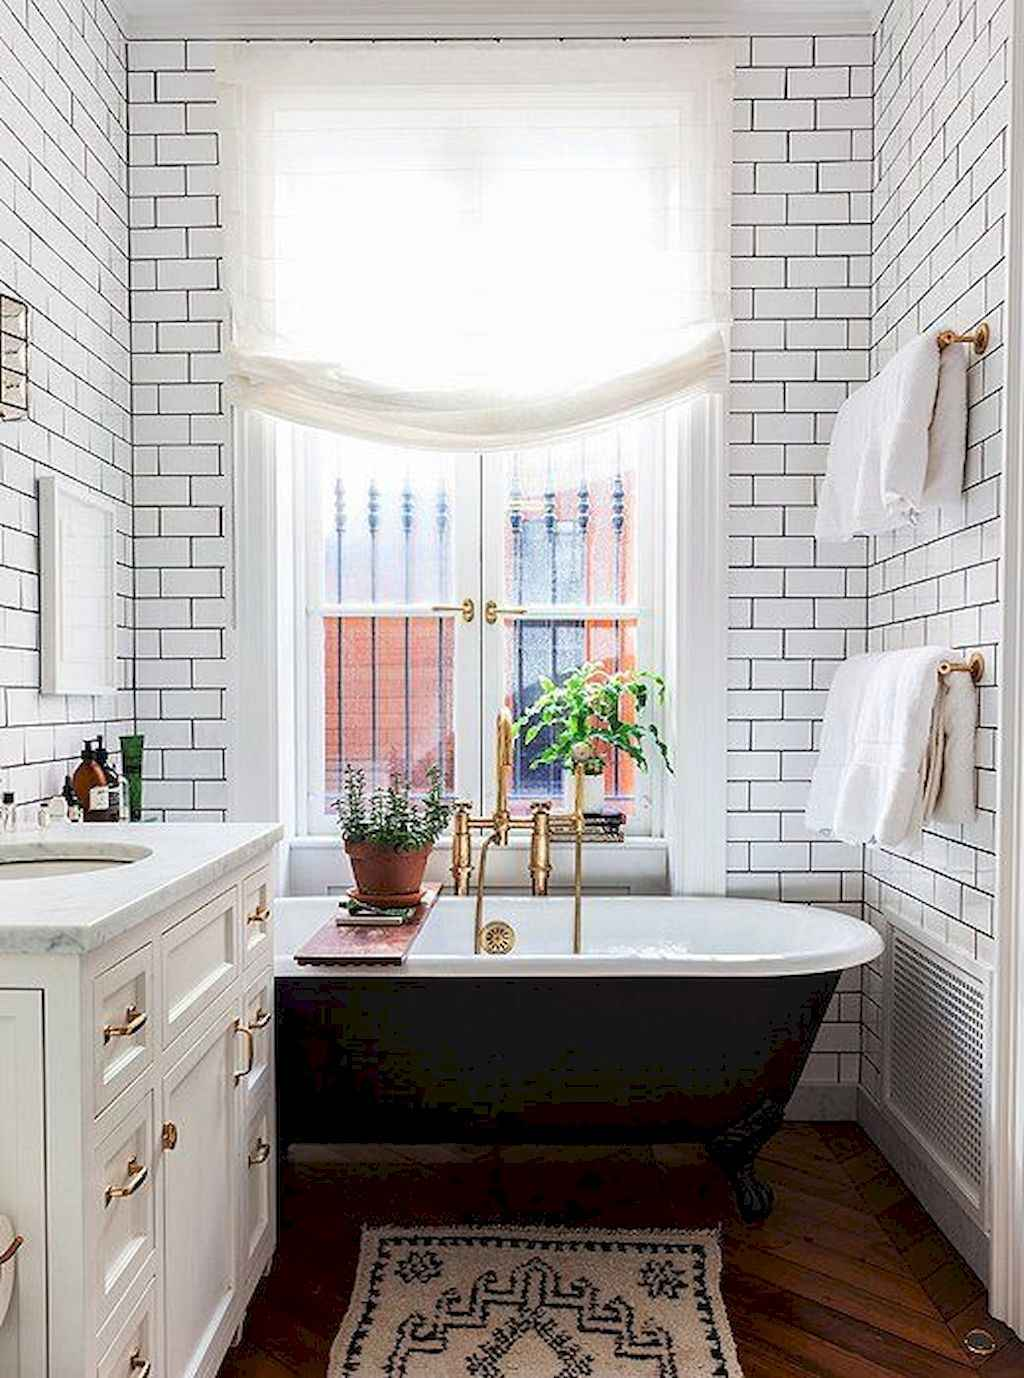 111 Brilliant Small Bathroom Remodel Ideas On A Budget (69)